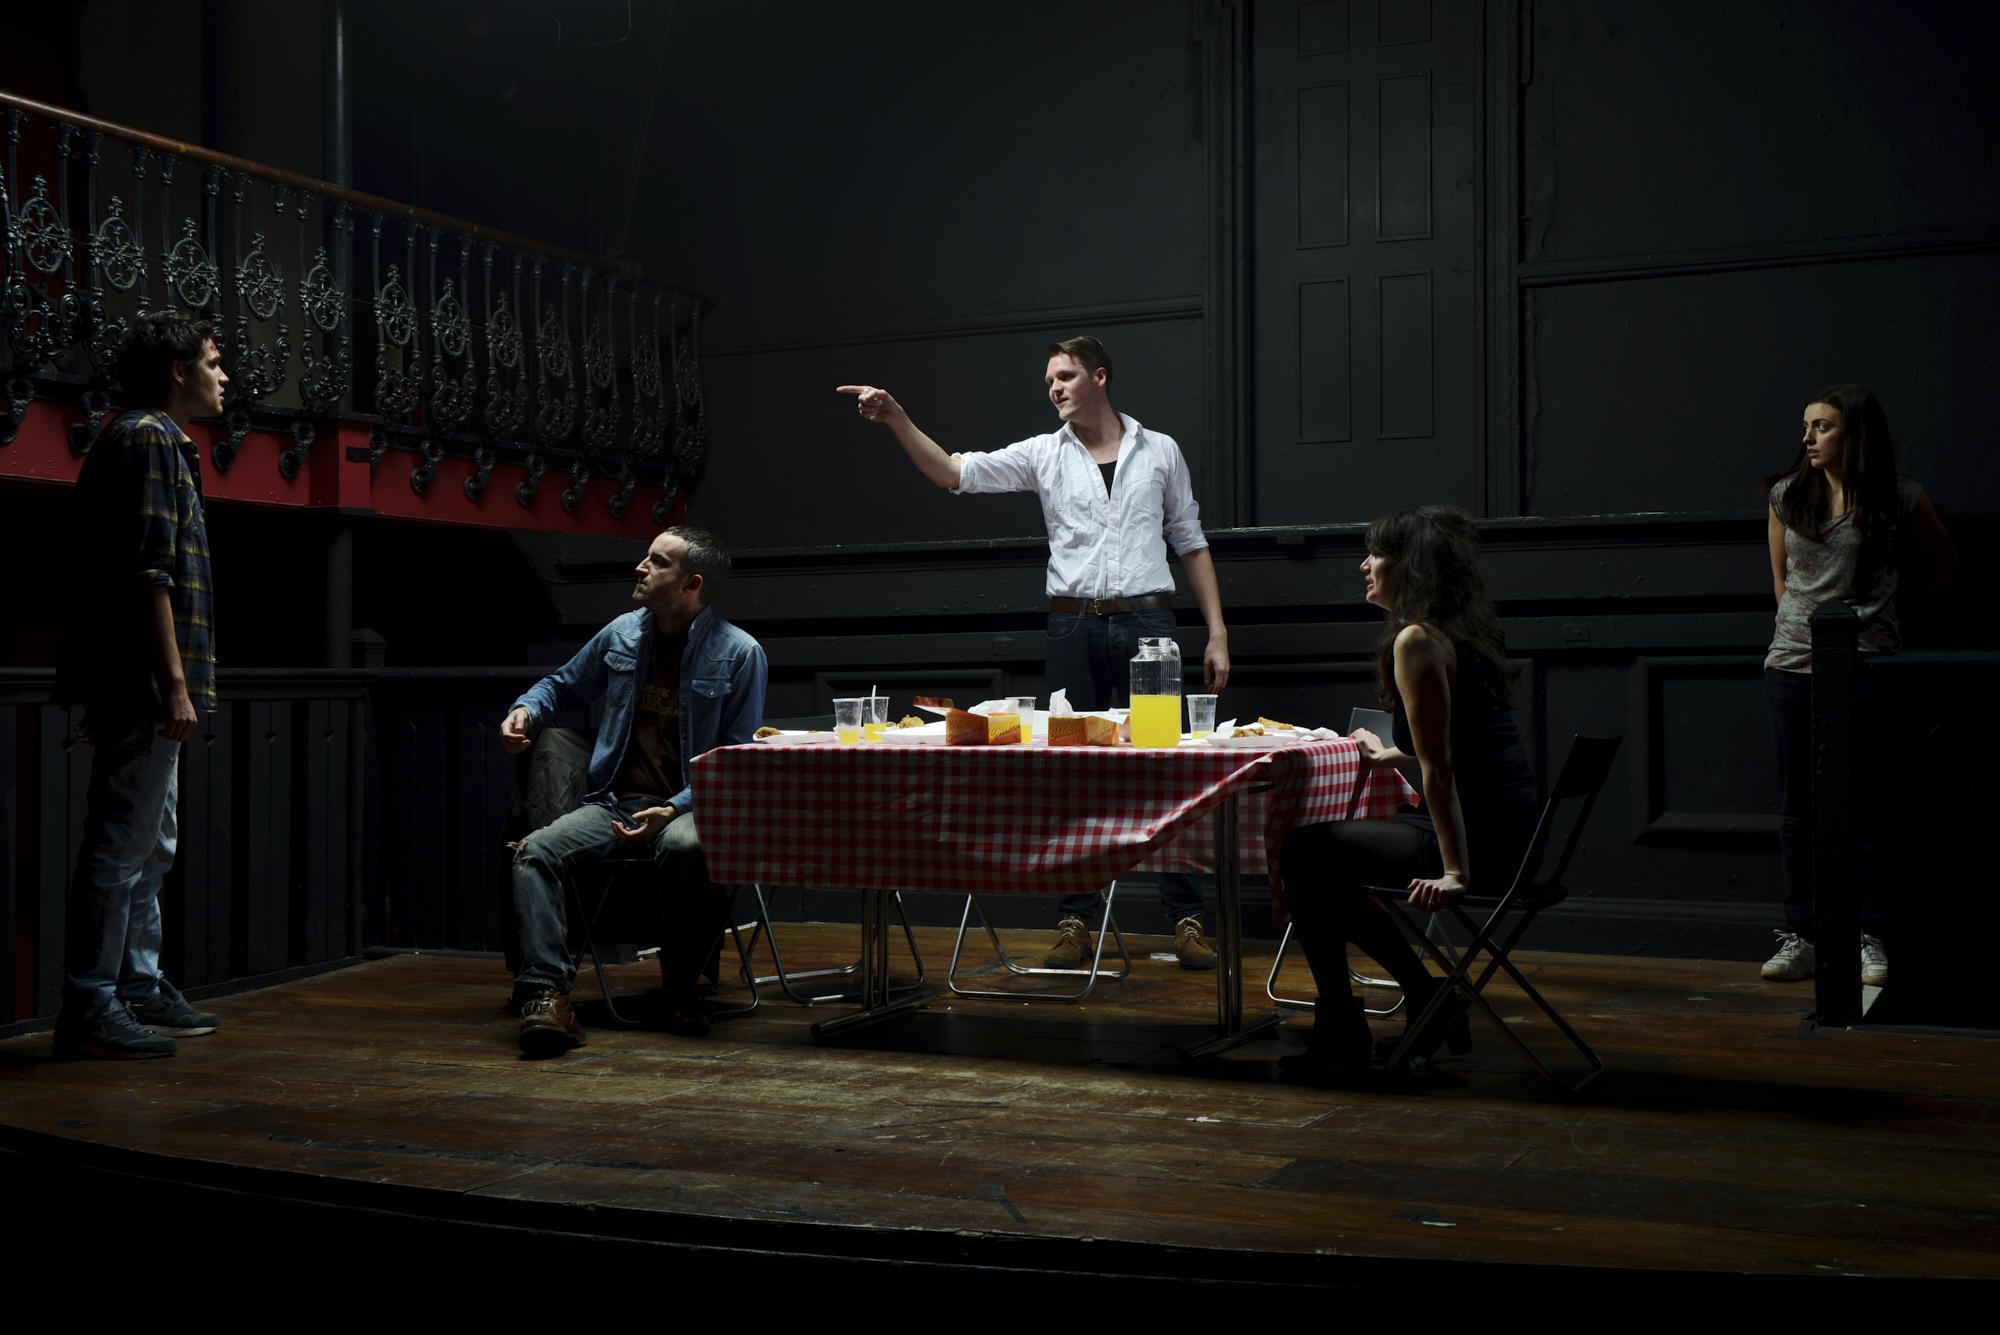 Rob Baker Ashton - The Understudy - The performance